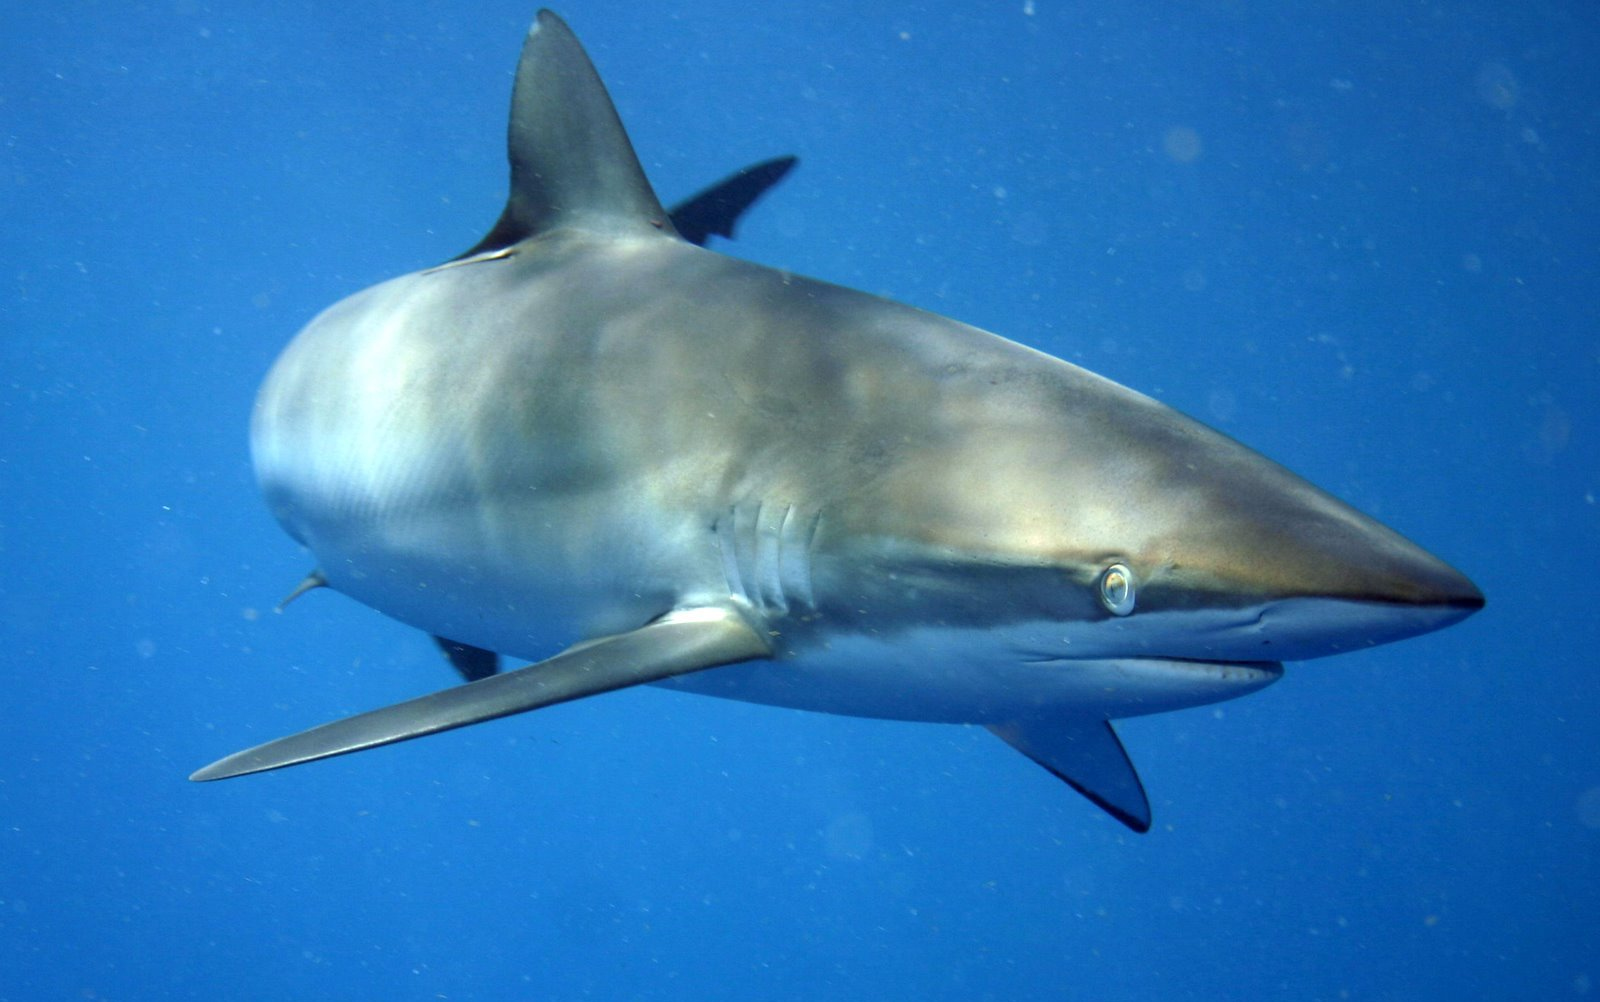 A Silky shark at Jardines de la Reina, Cuba